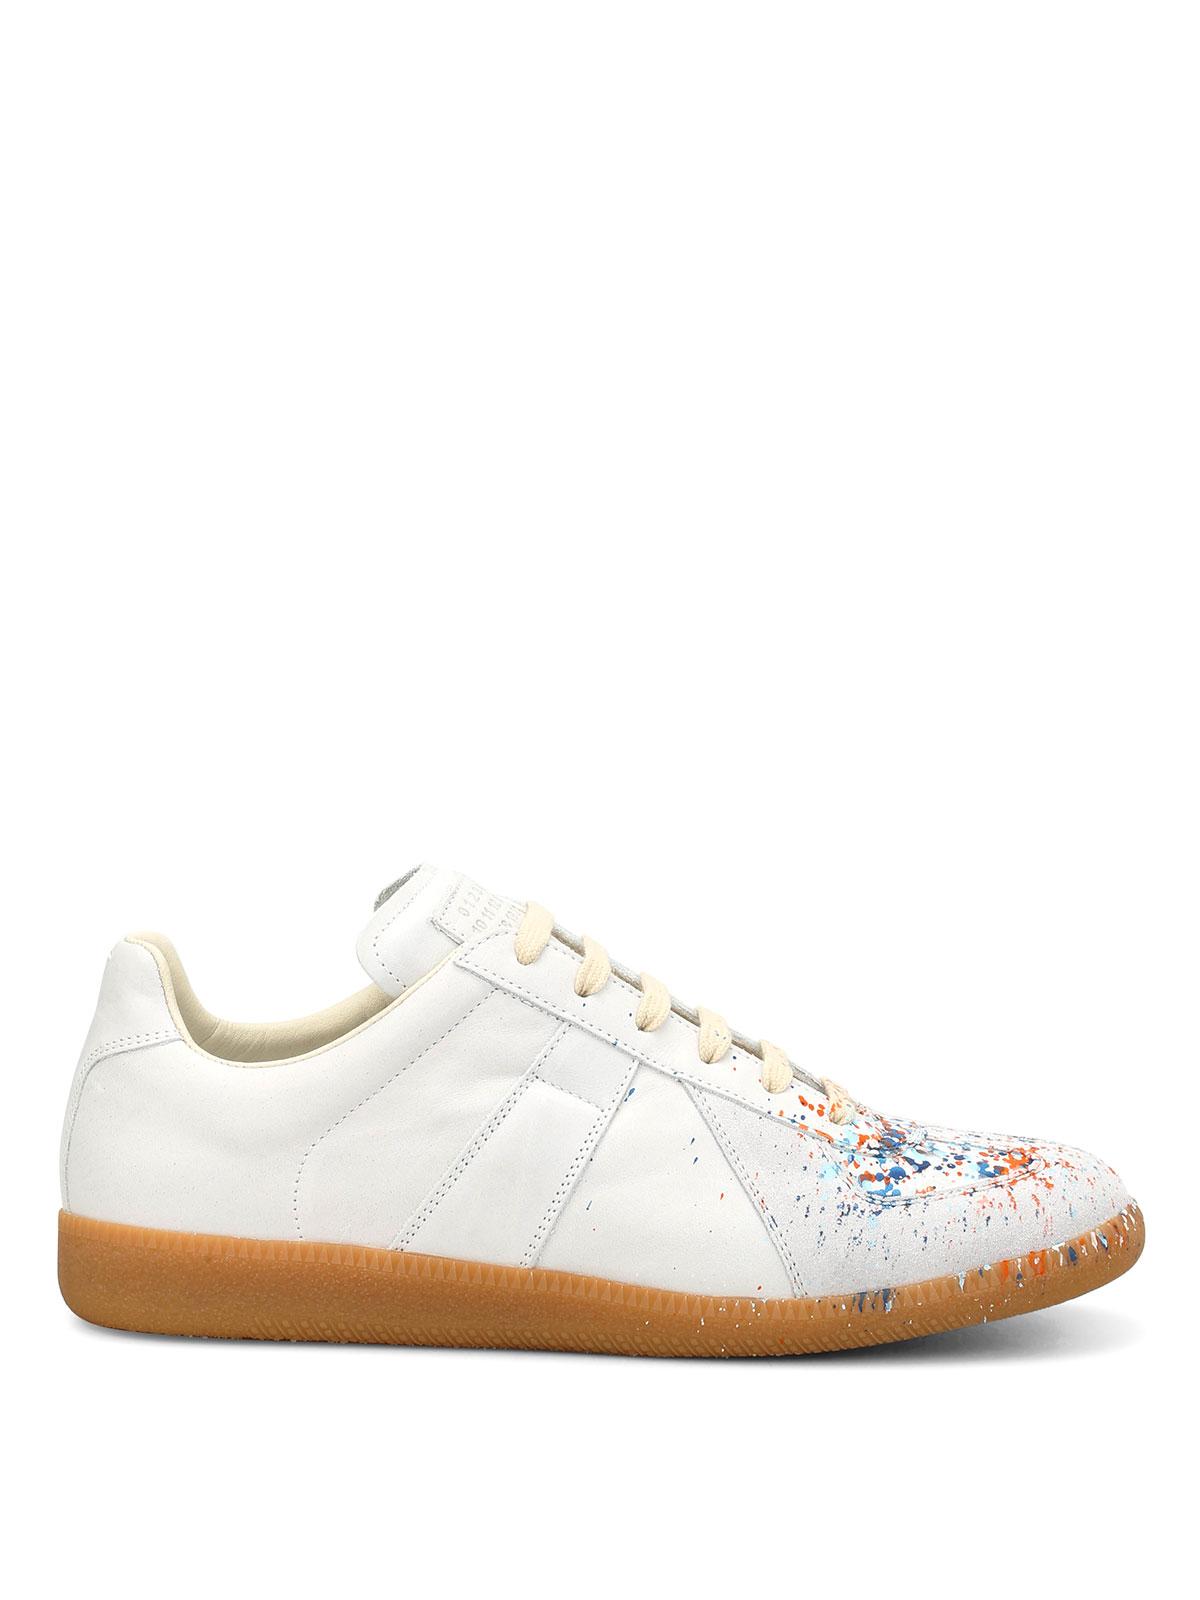 Sneaker Replica Margiela 964 S57ws0124 Sy0104 Sneakers Maison AEqgx5E